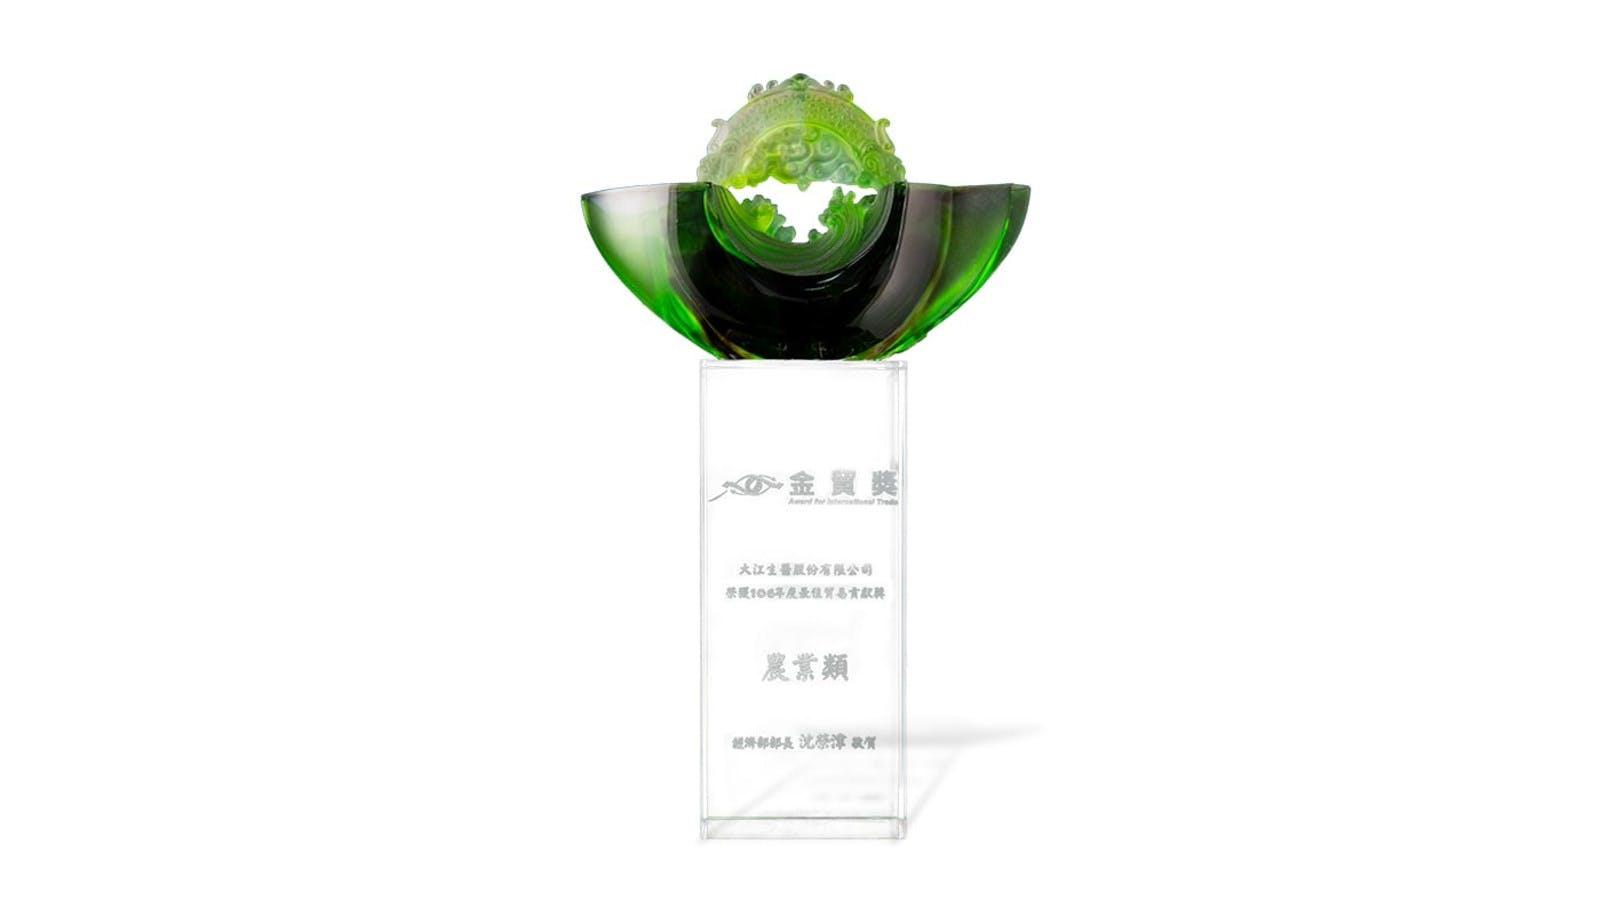 TCI 大江生醫榮獲經濟部國際貿易局與外貿協會合頒金貿獎